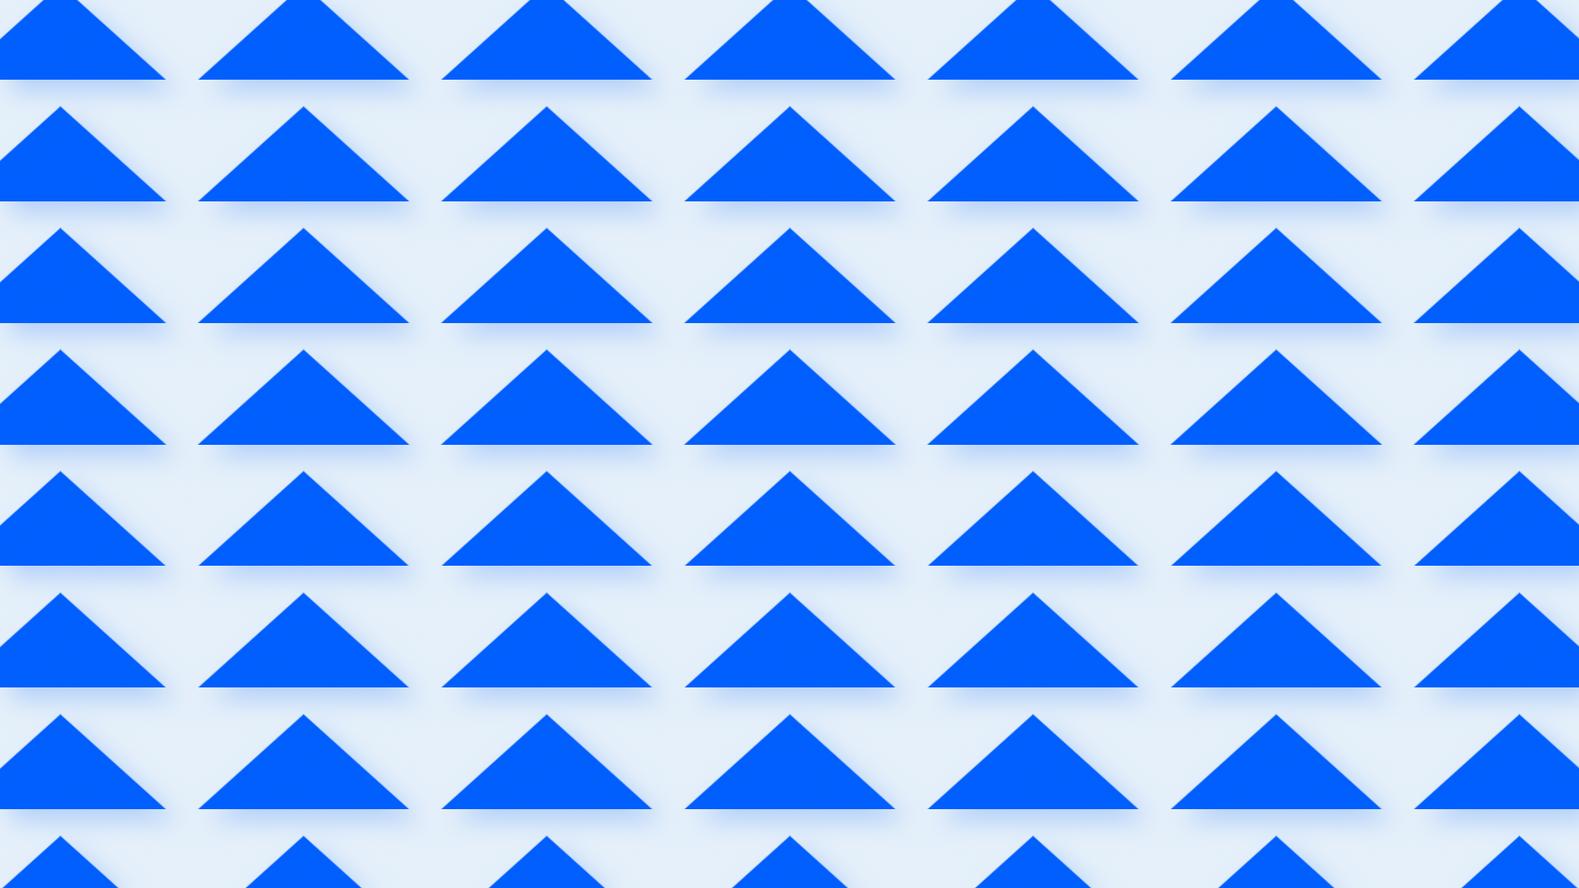 blue_introB_5994.216115.png